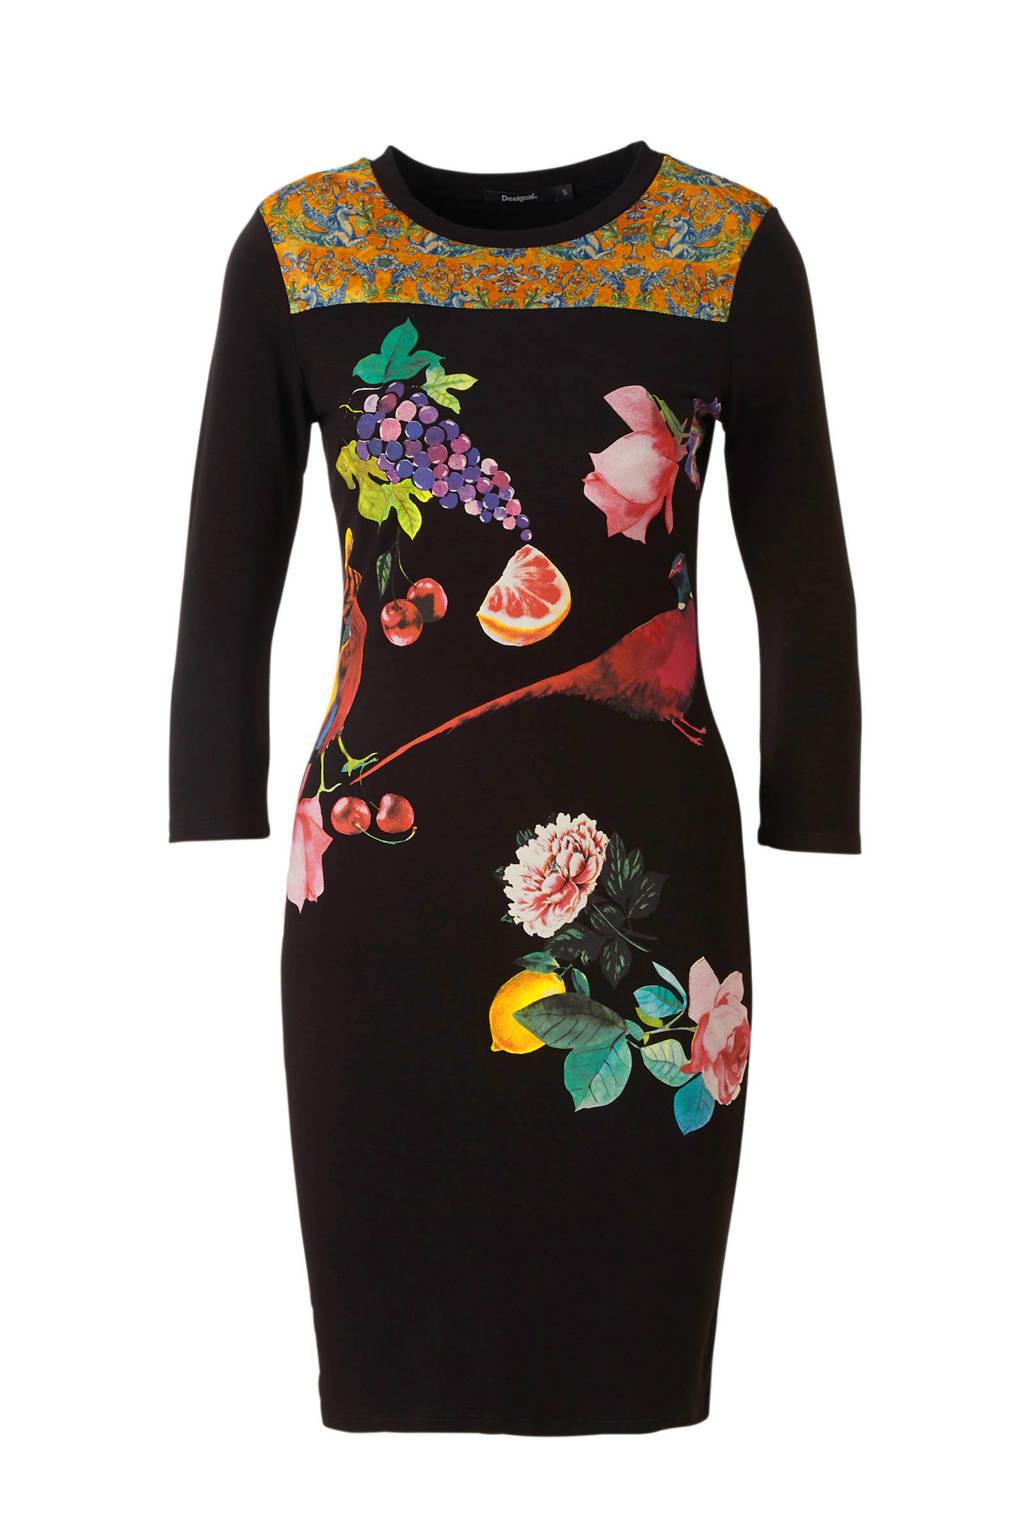 2fb9d5bb82d269 Desigual jurk met print zwart